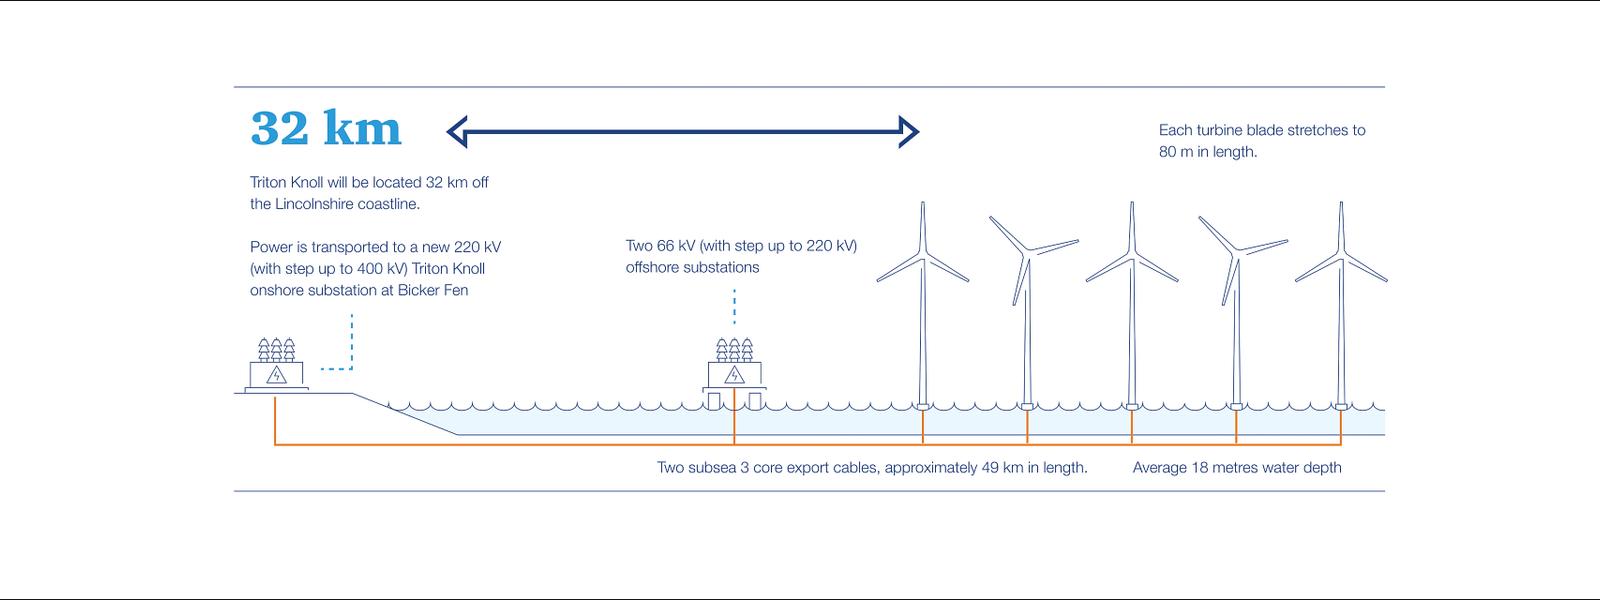 Triton Knoll infographic fullsize image